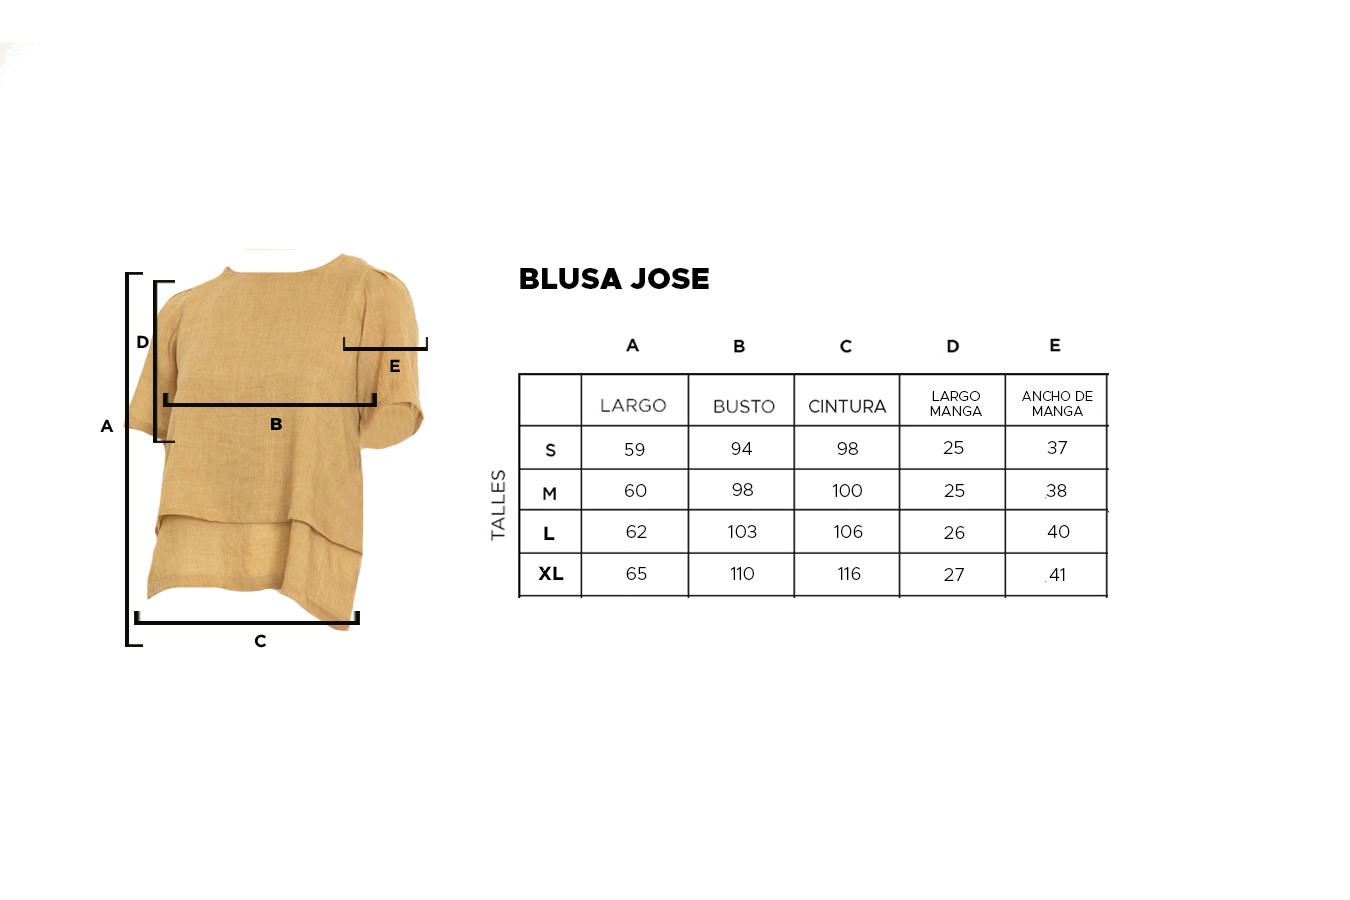 BLUSA JOSE